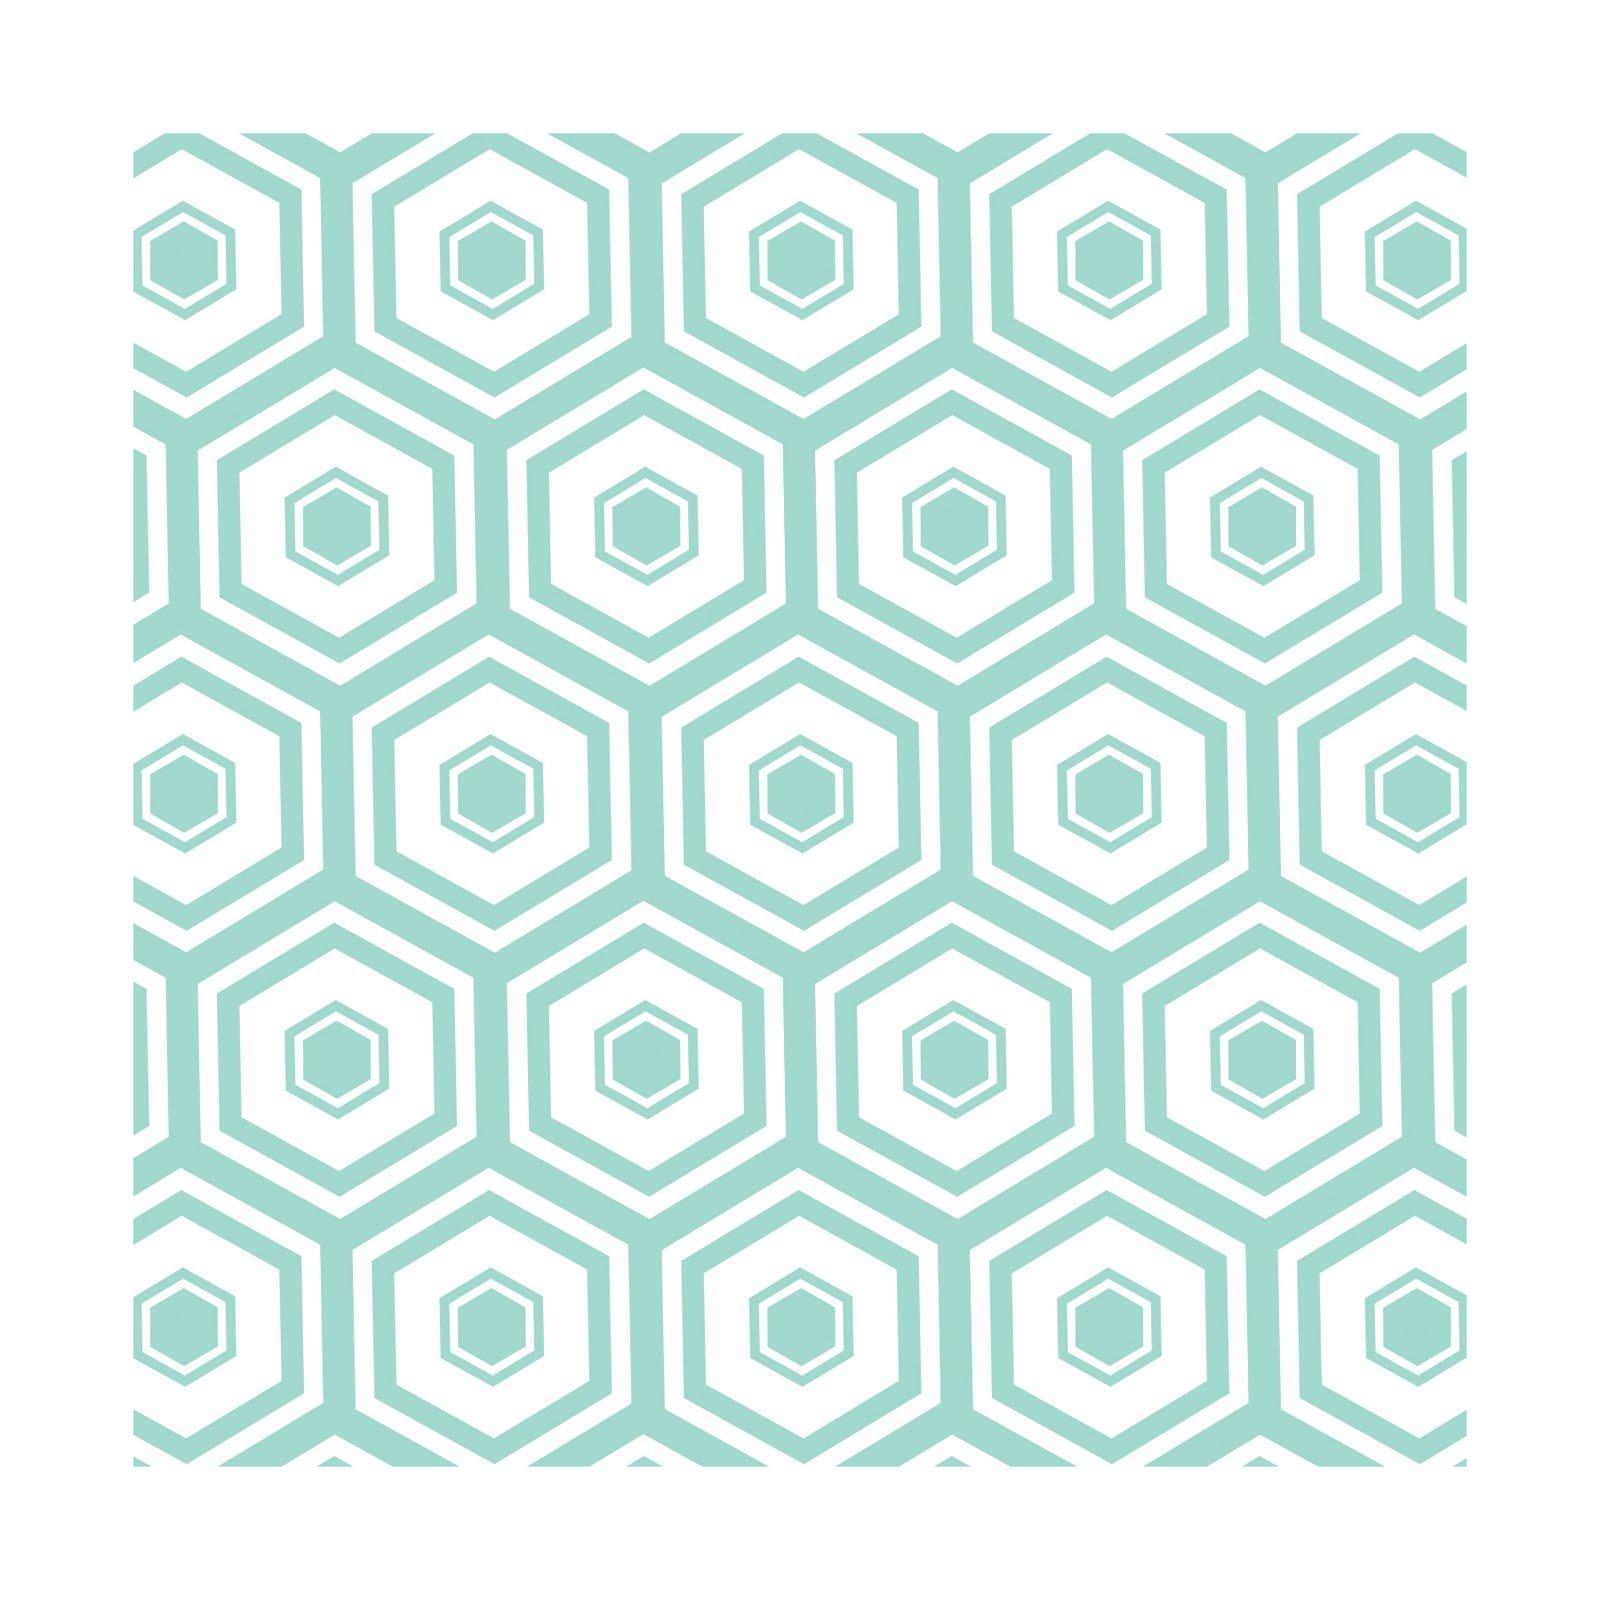 Camelot Fabrics Honeycomb Flannel 4150009B-01 Mint `